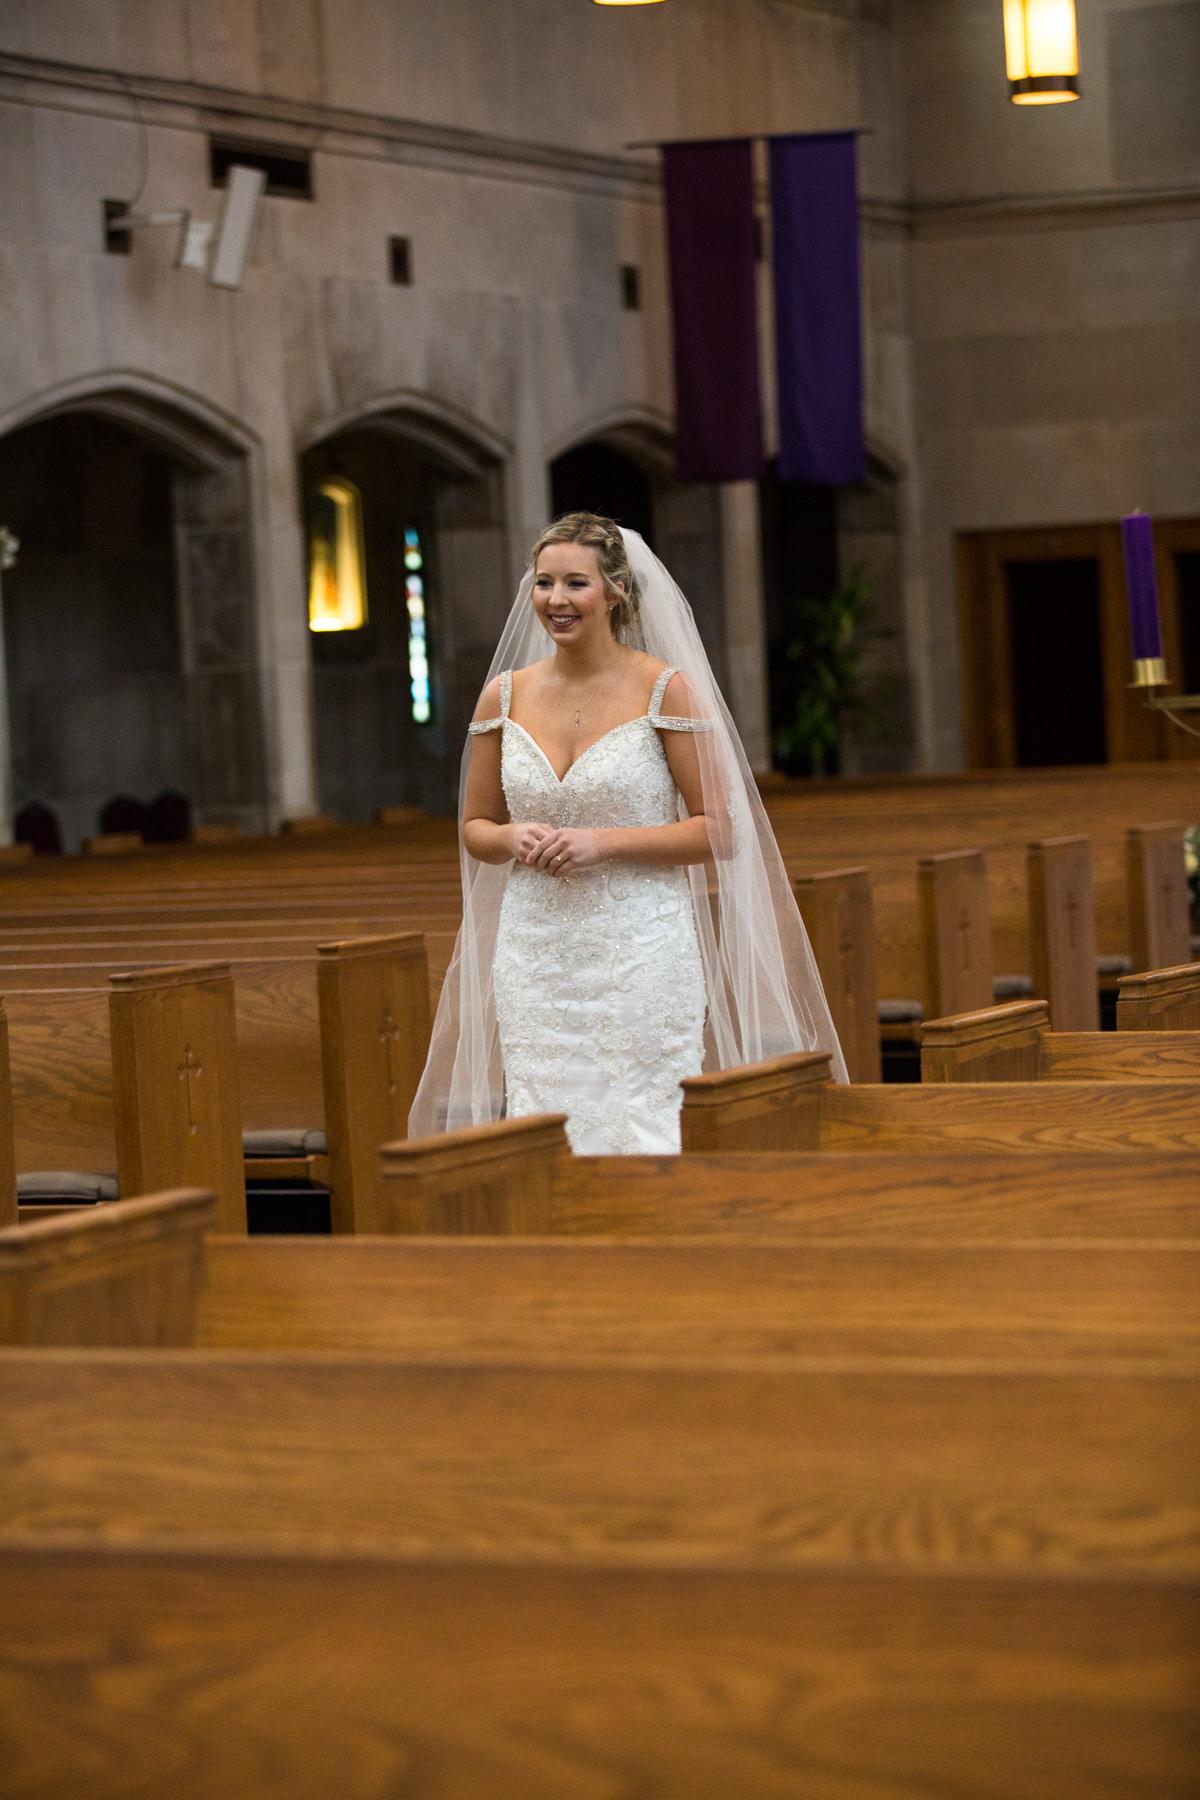 Kelli-and-Matt-Nashville-Wedding-Sneak-Peak-0109.jpg